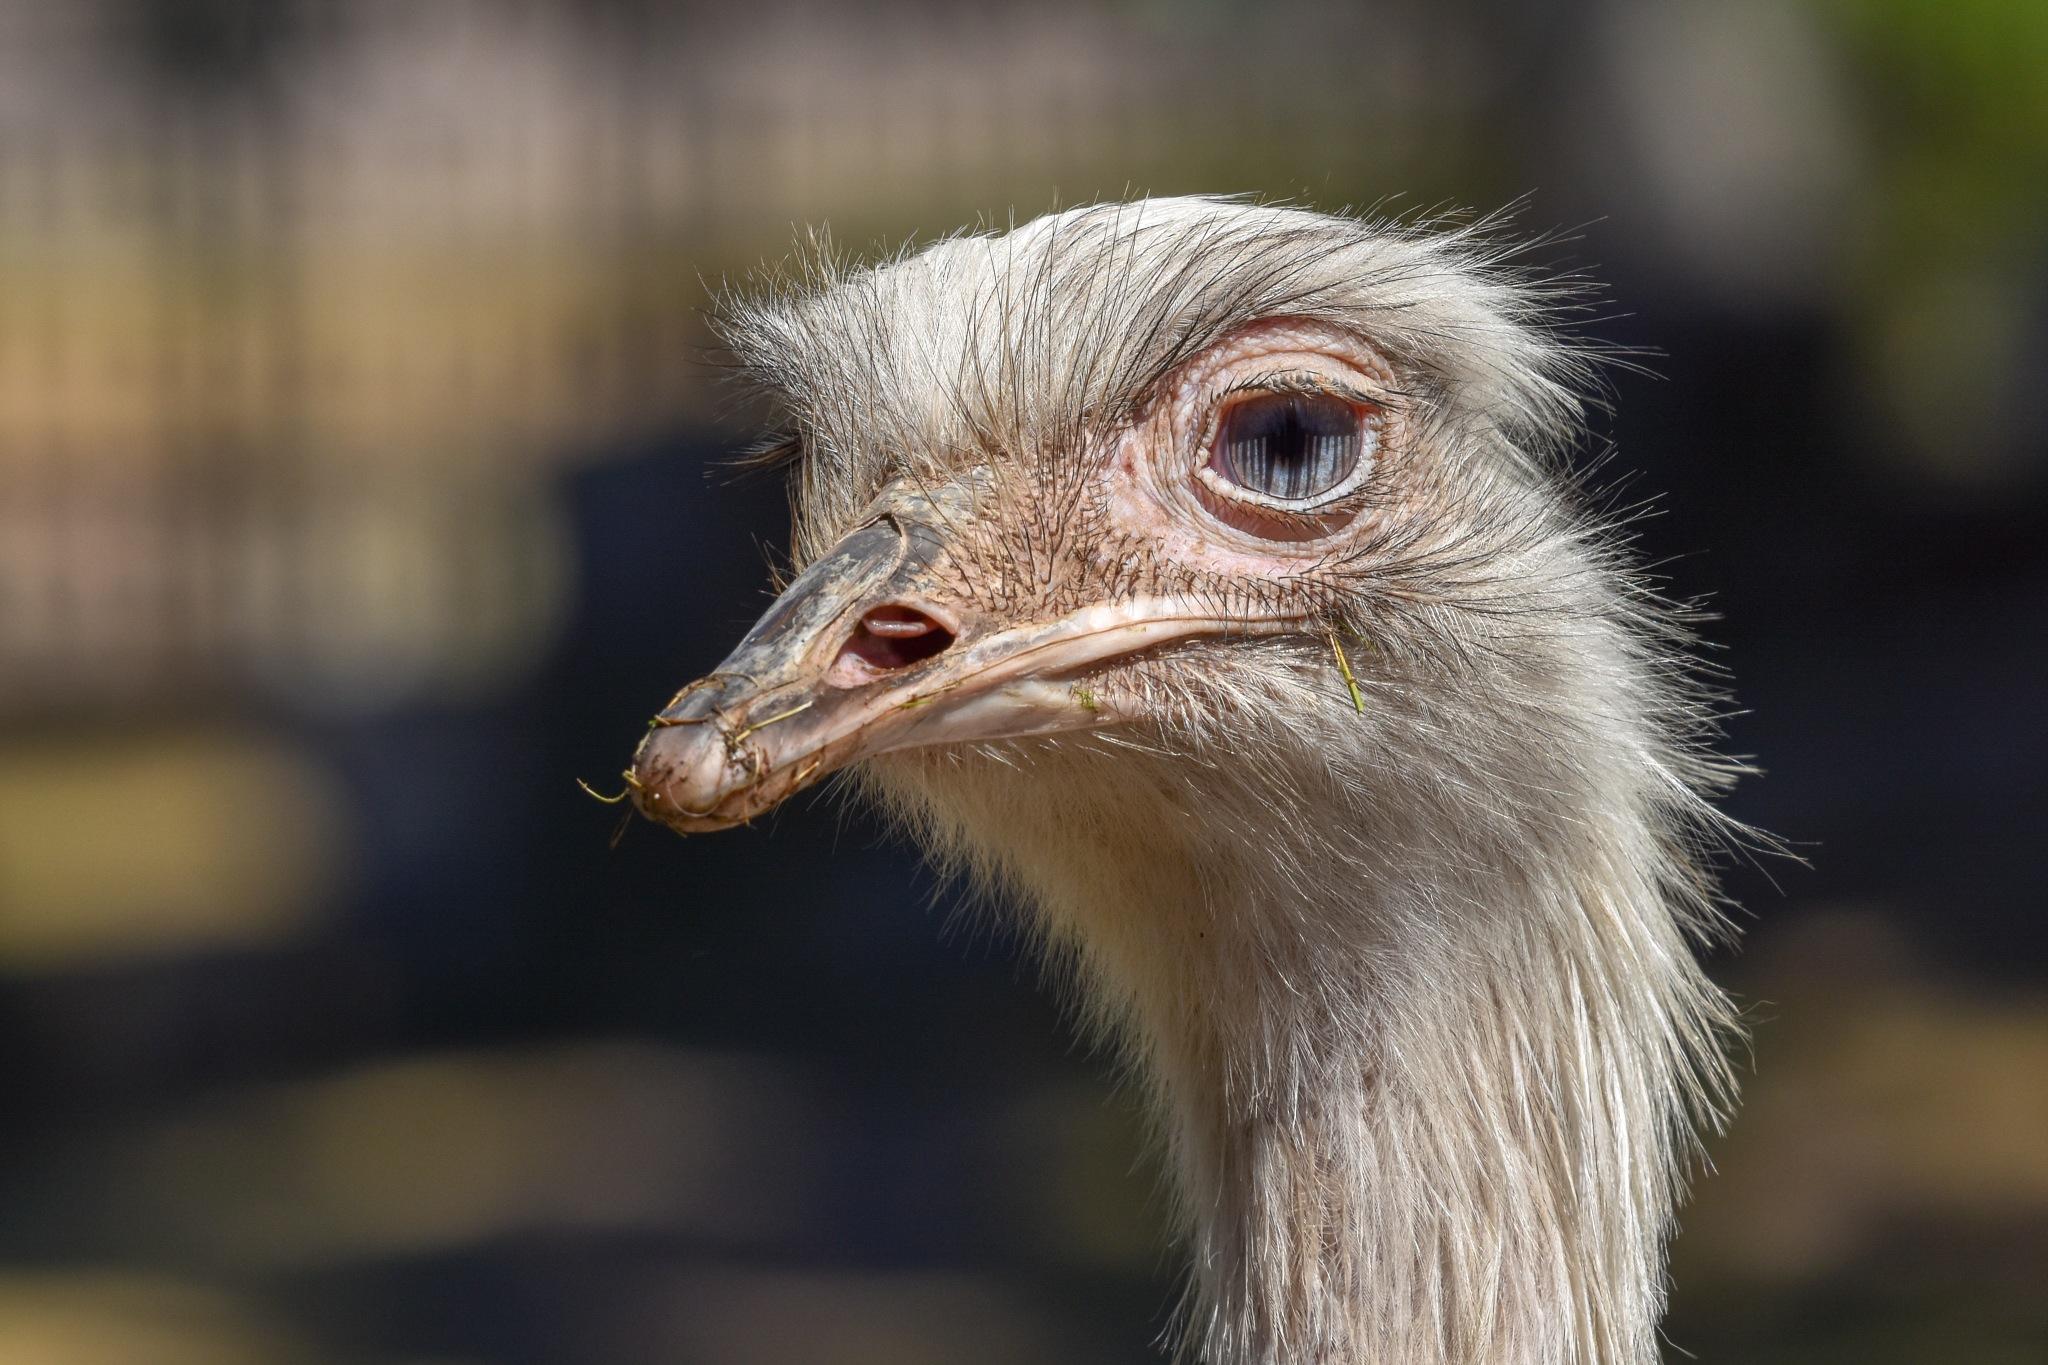 Ostrich by monica.westerholm.5